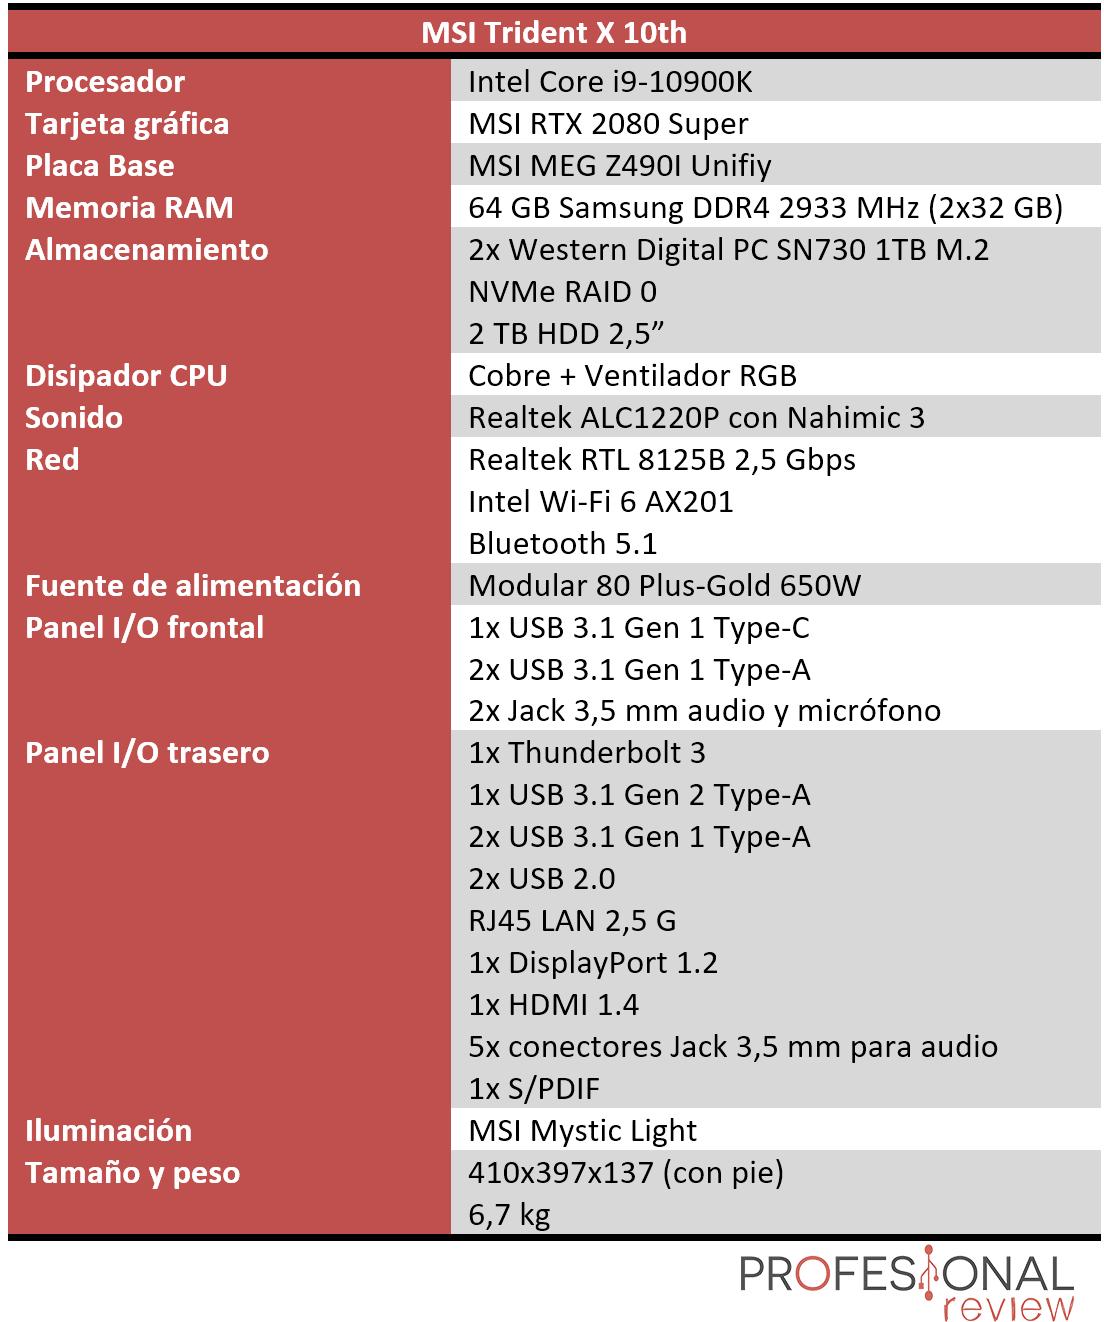 MSI Trident X 10th Características